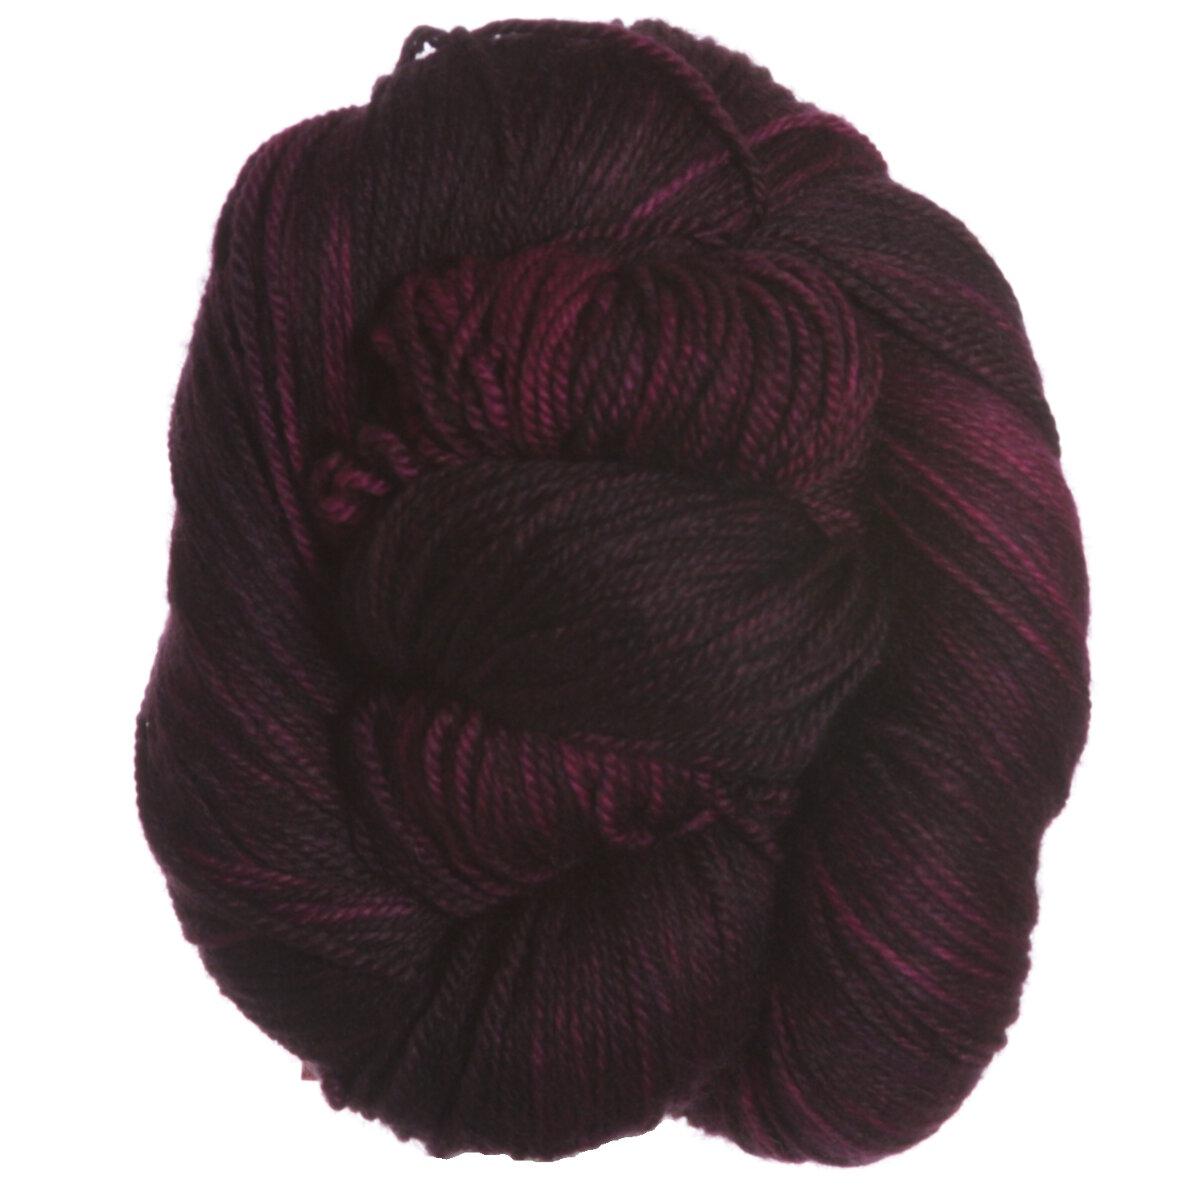 Zen Yarn Garden Serenity 20 Yarn - Poodle Skirt at Jimmy Beans Wool